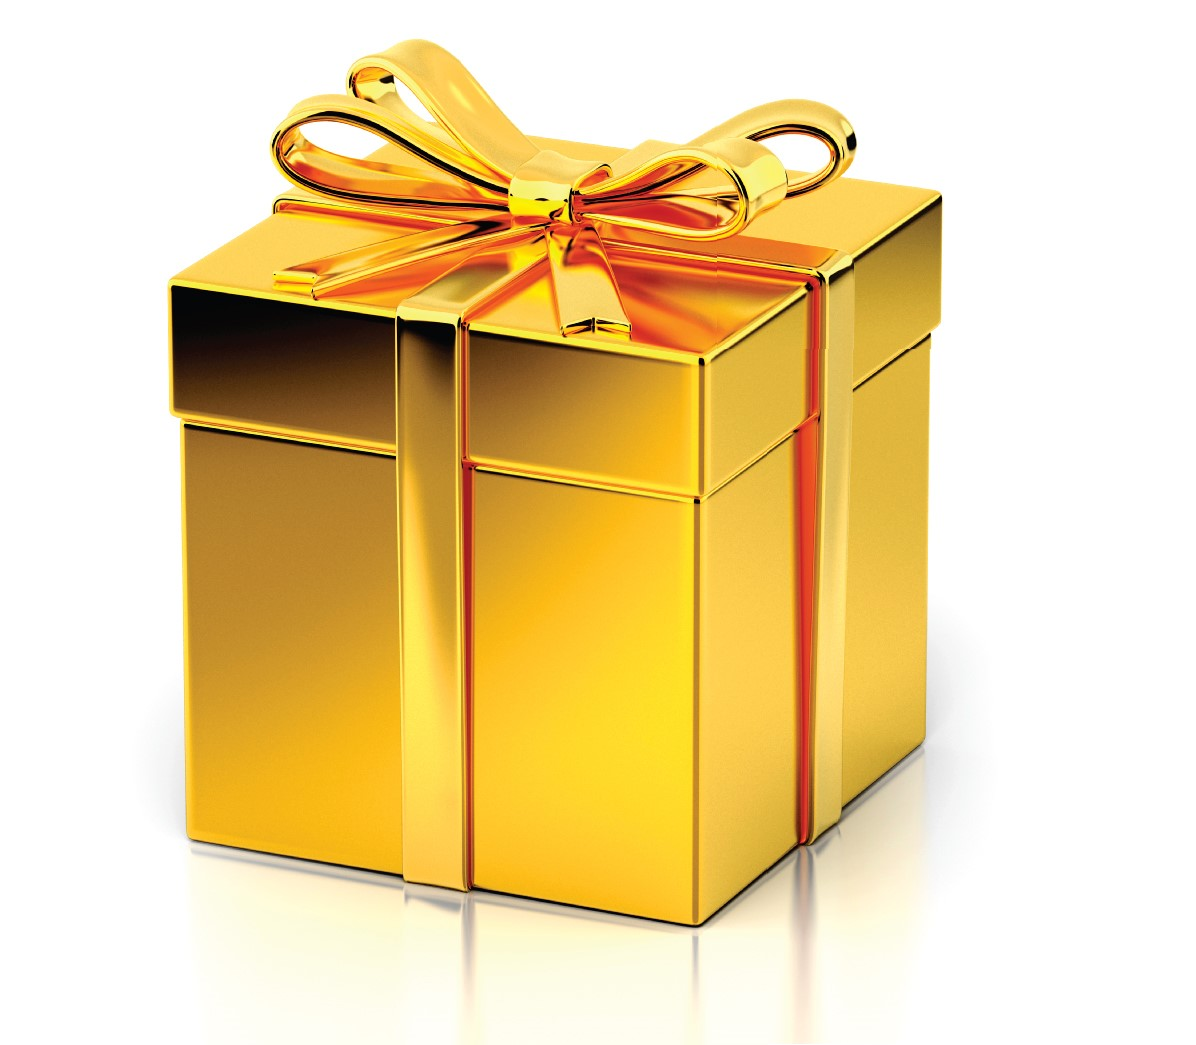 Hoilday Gift Ideas